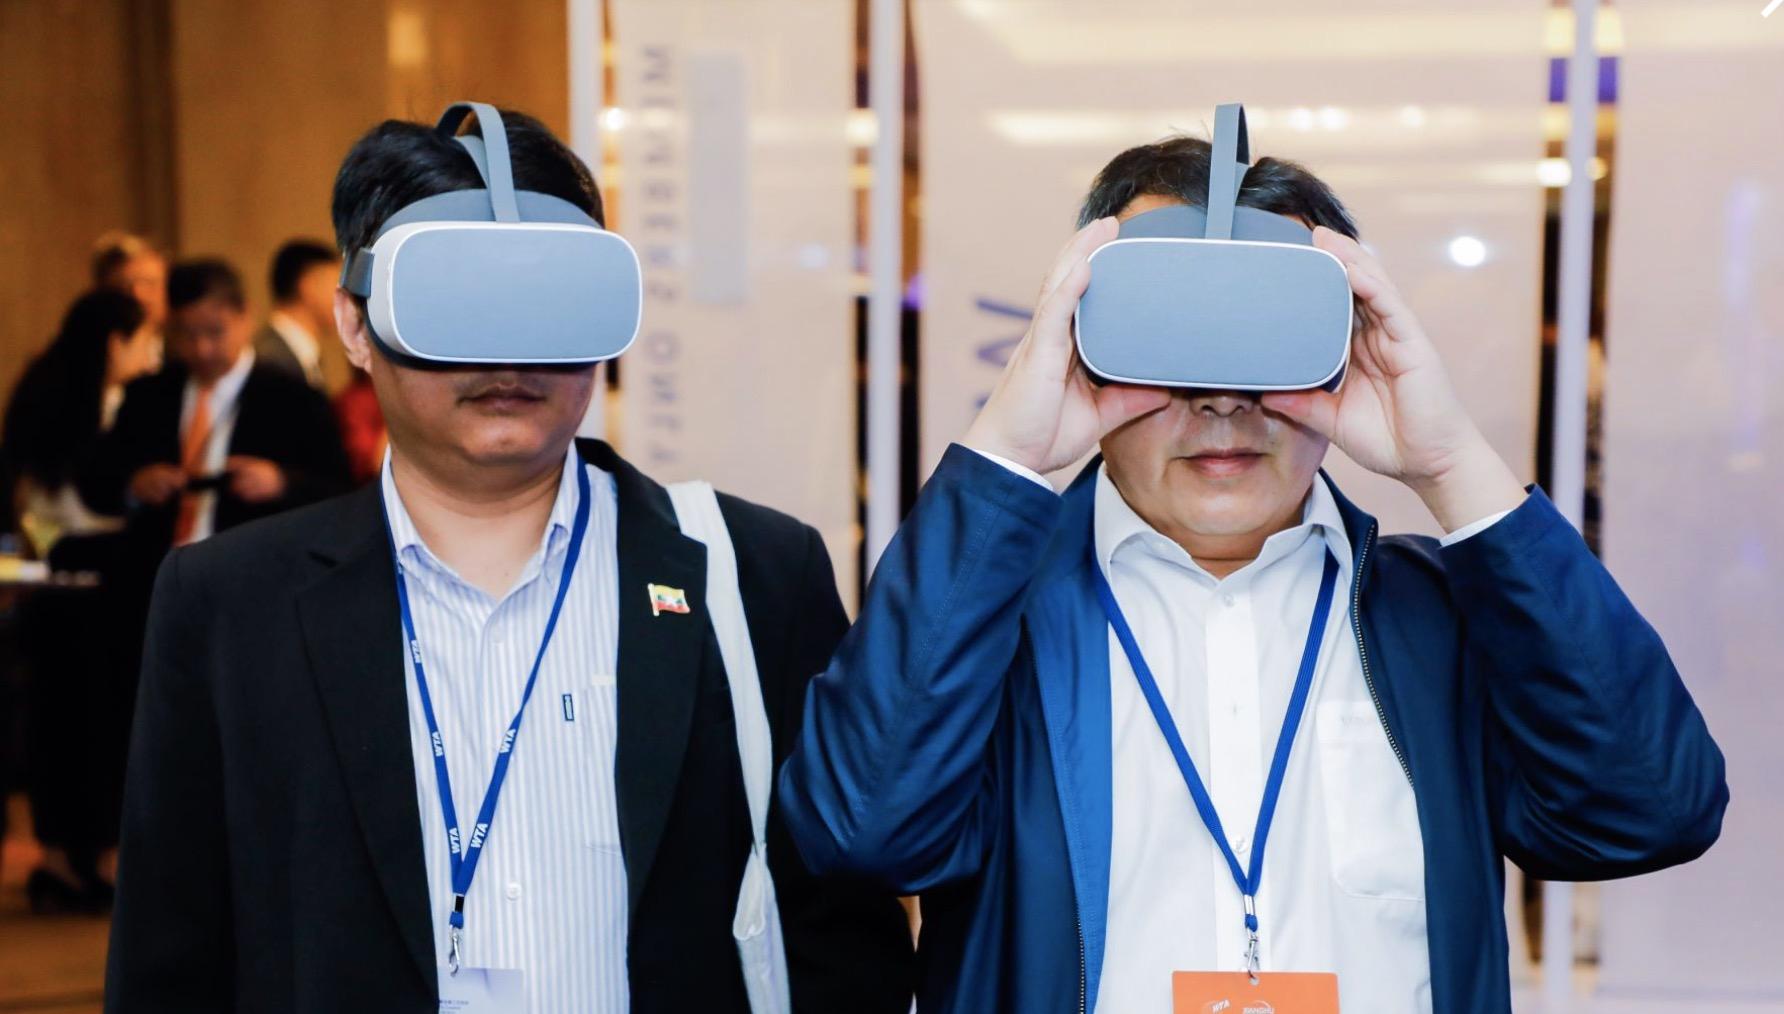 Xianghu Dialogue: Tourism and the digital transformation